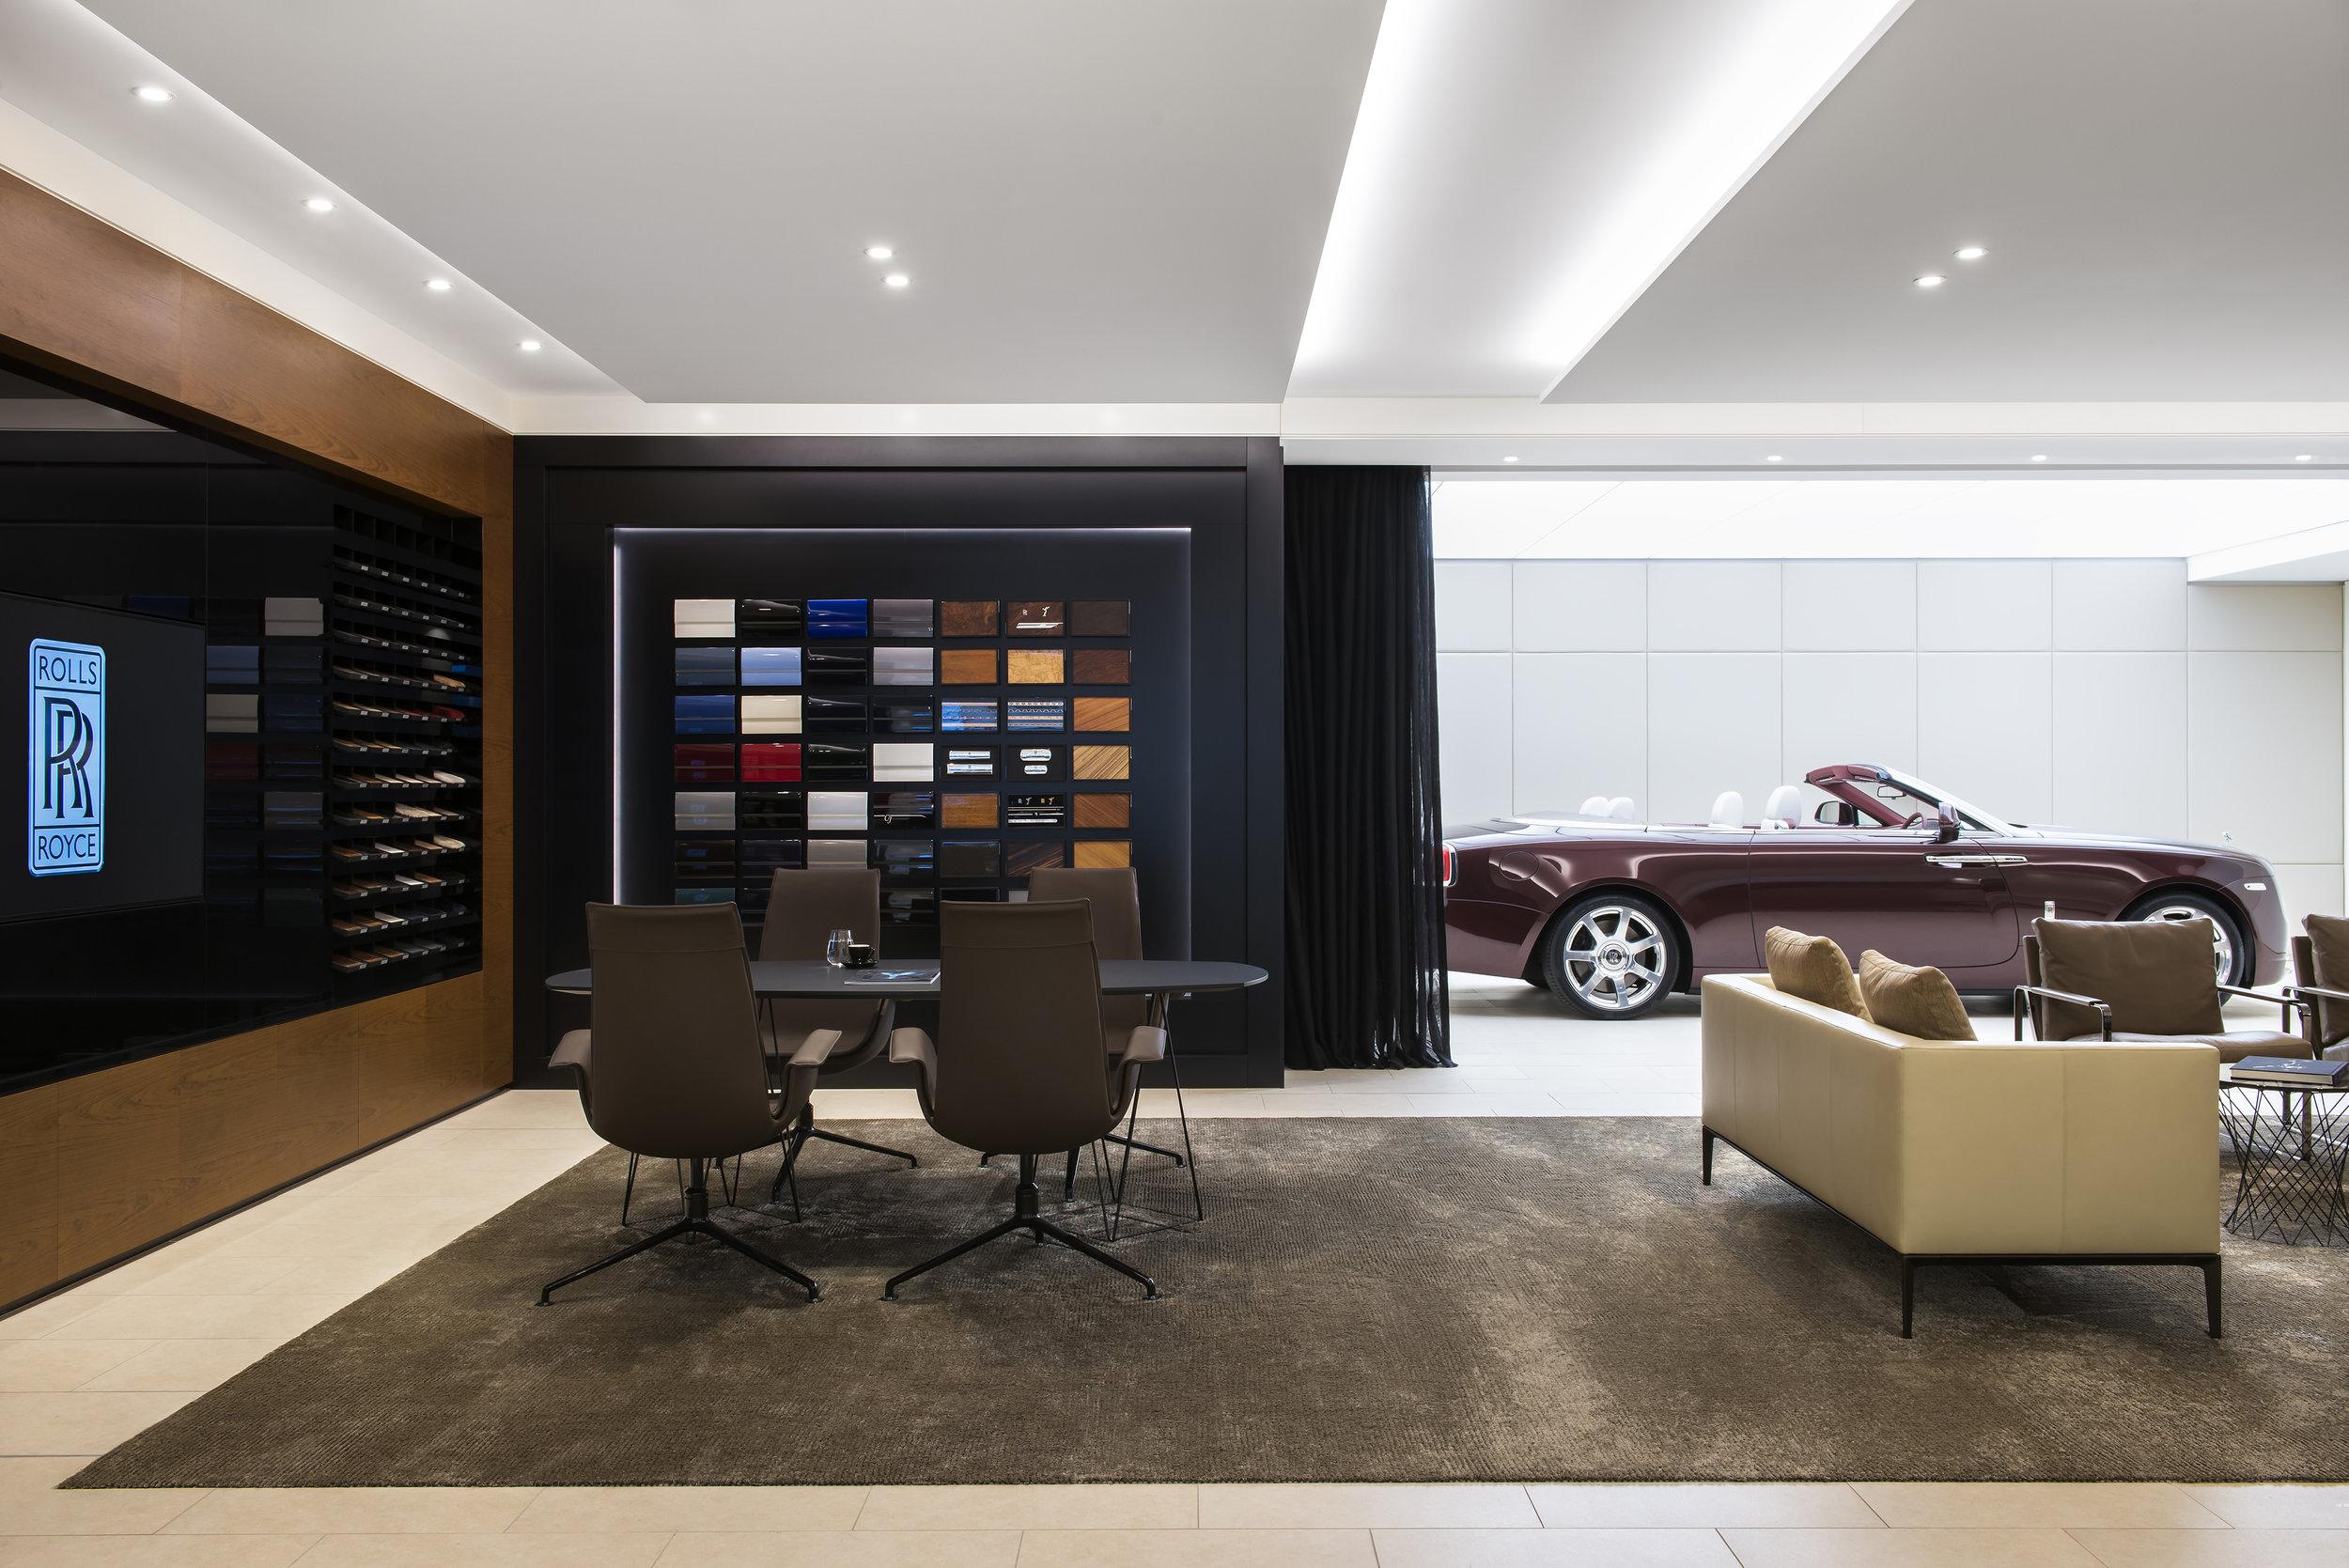 Rolls_Royce_Retail_1.jpg